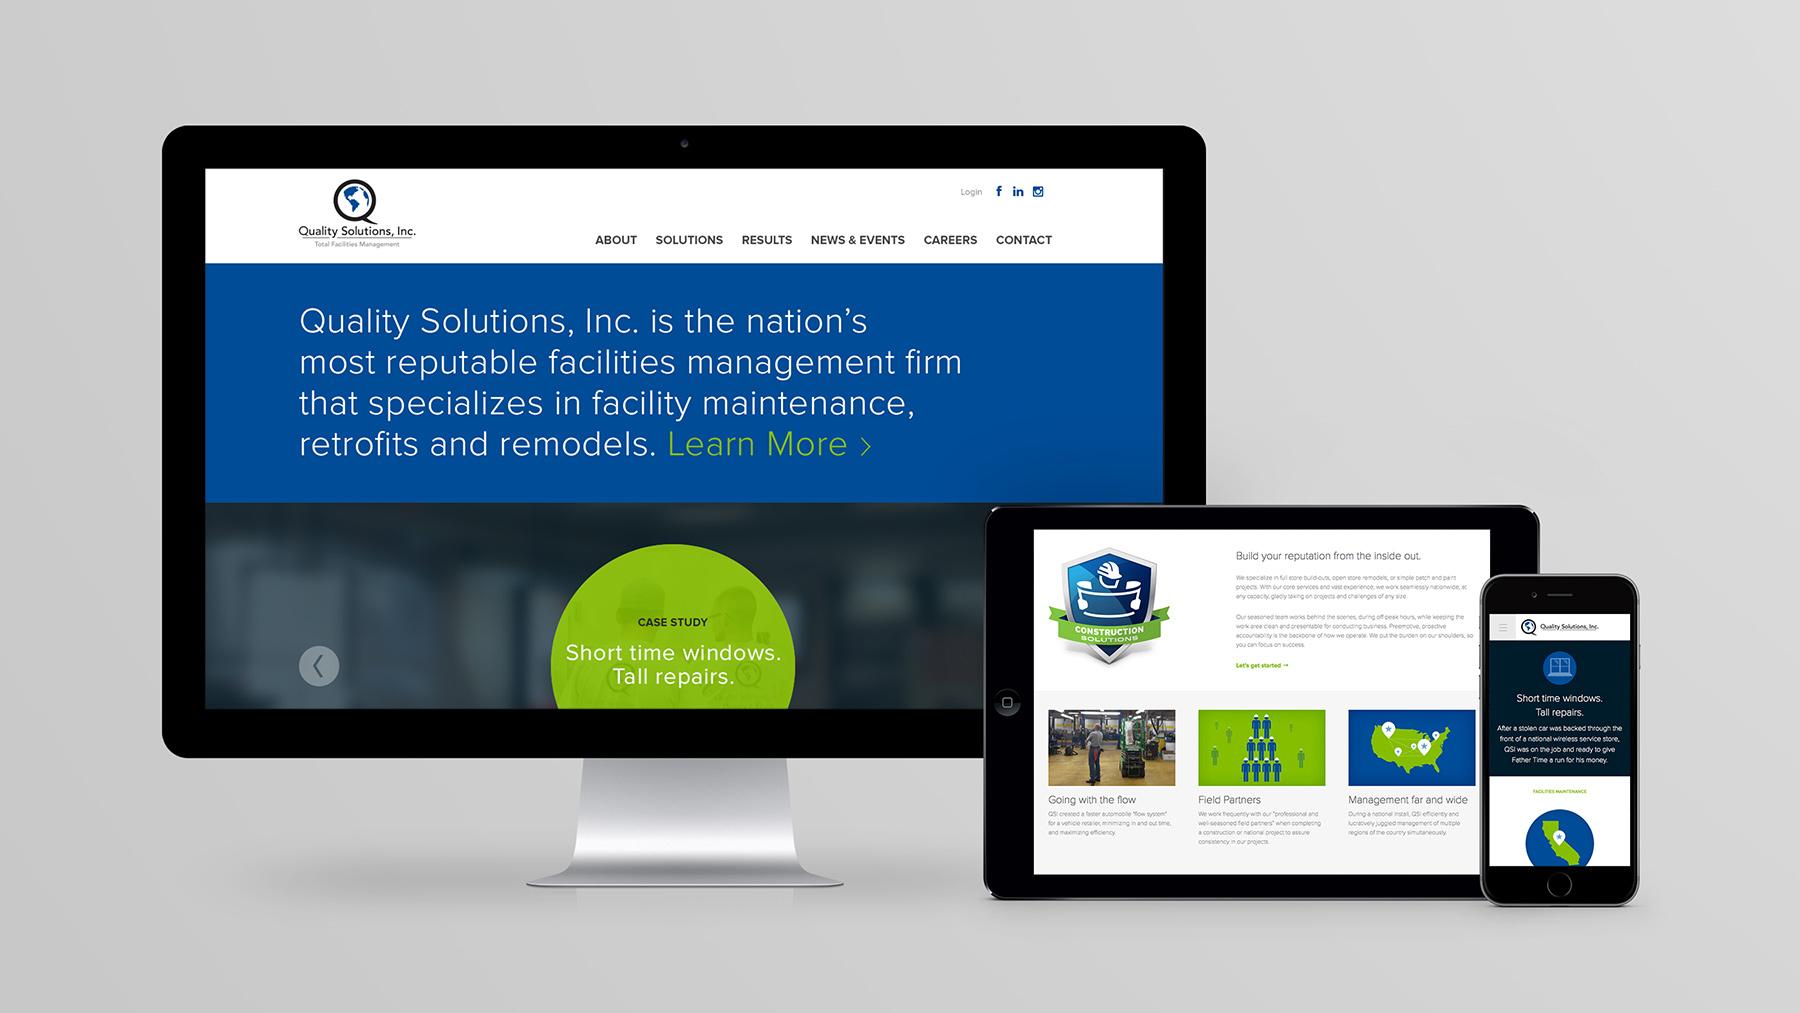 jajo-qsi-website-casestudy-1